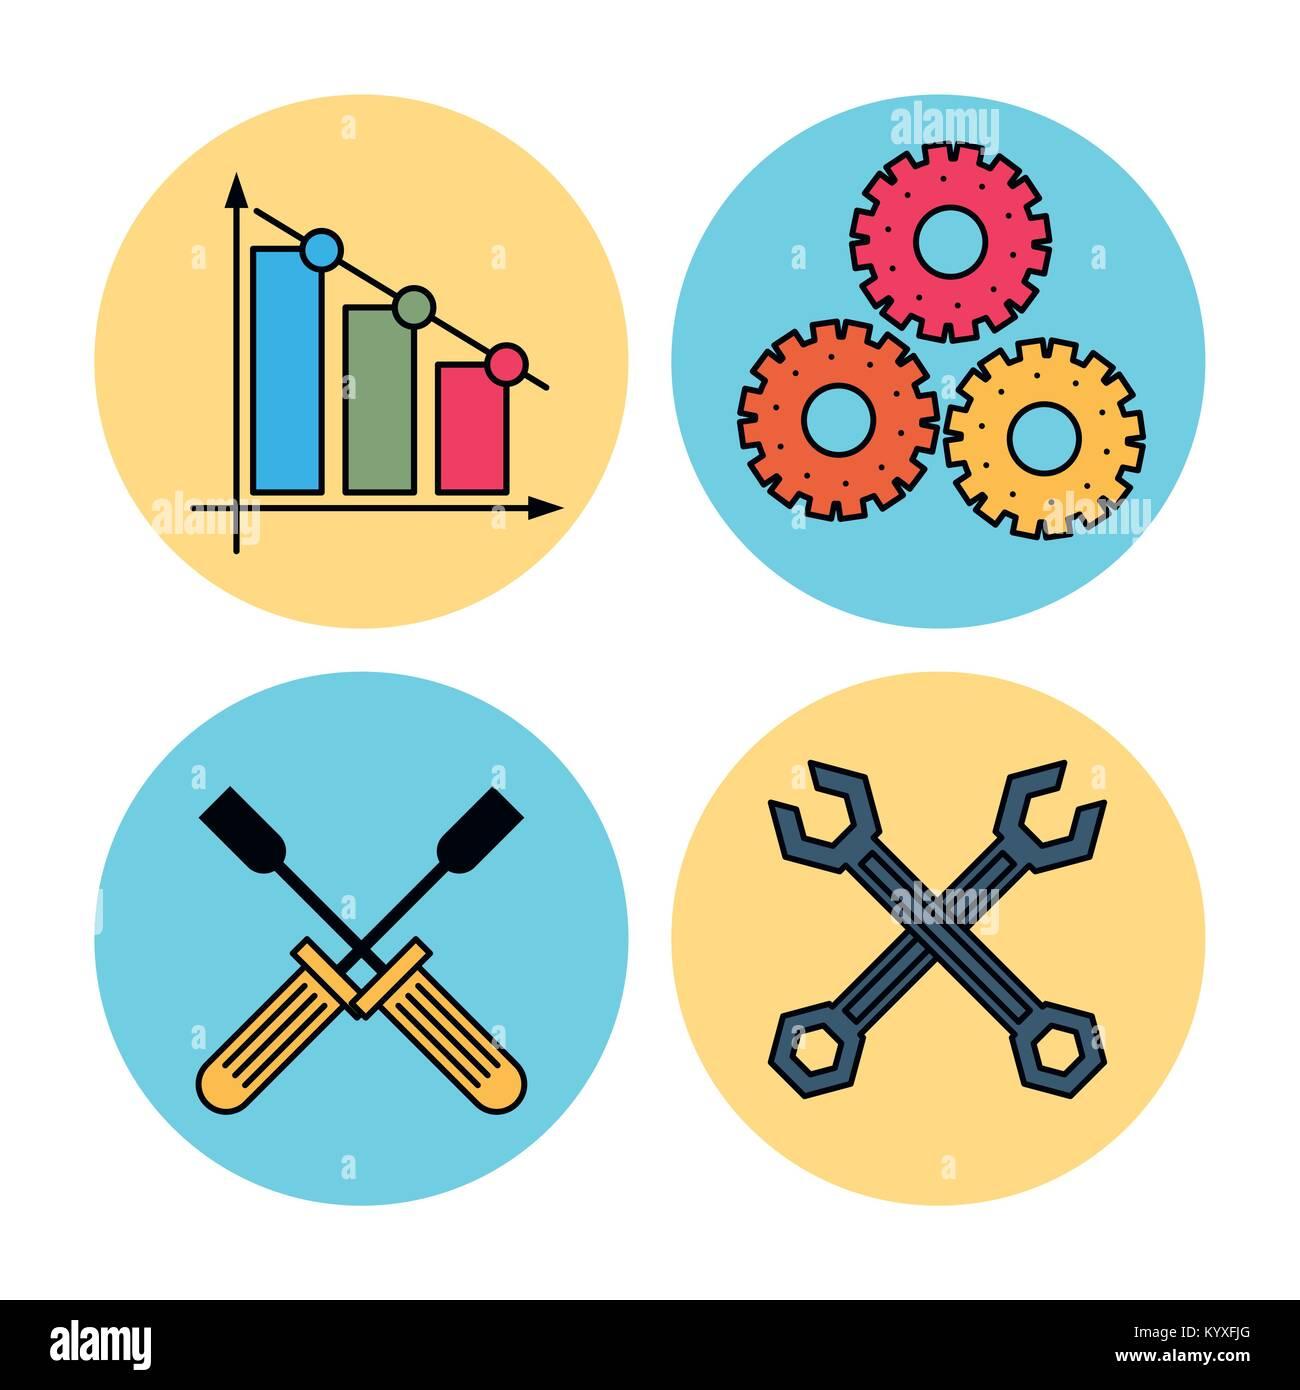 Technical service icons Stock Vector Art & Illustration, Vector ...